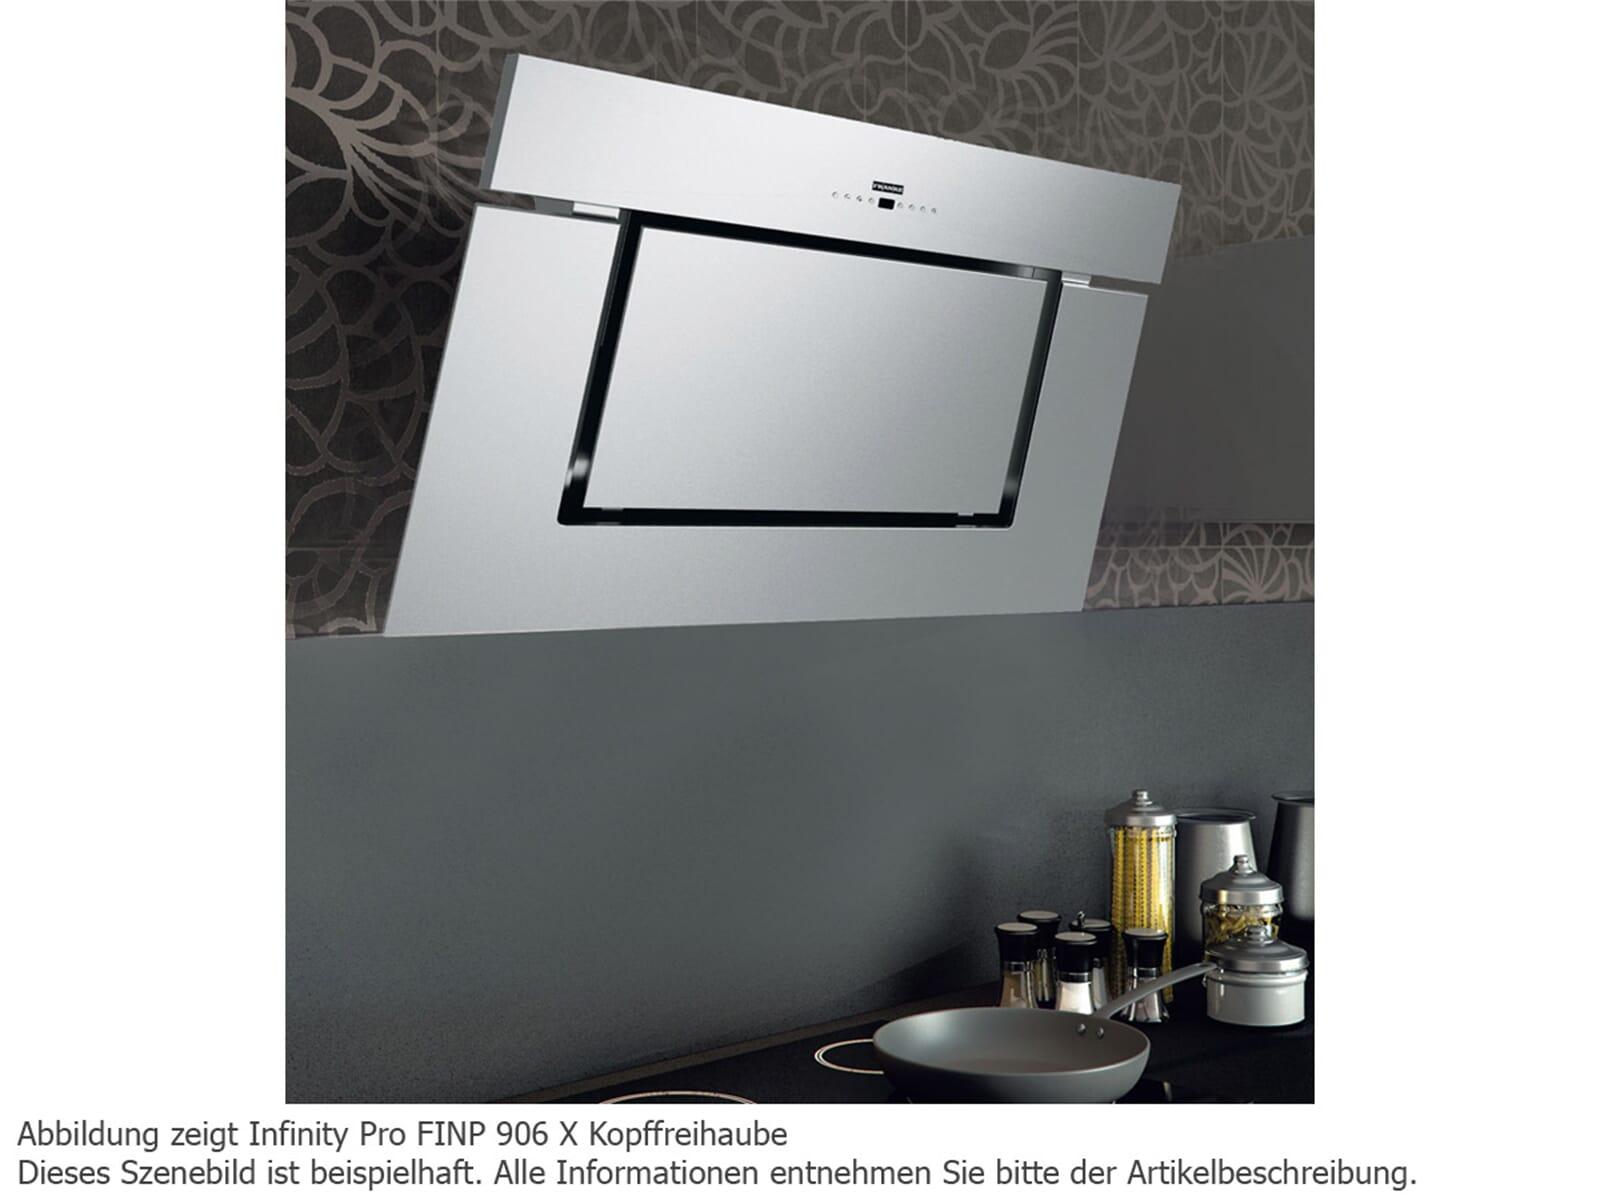 franke infinity pro finp 906 bk mt kopffreihaube schwarz matt. Black Bedroom Furniture Sets. Home Design Ideas